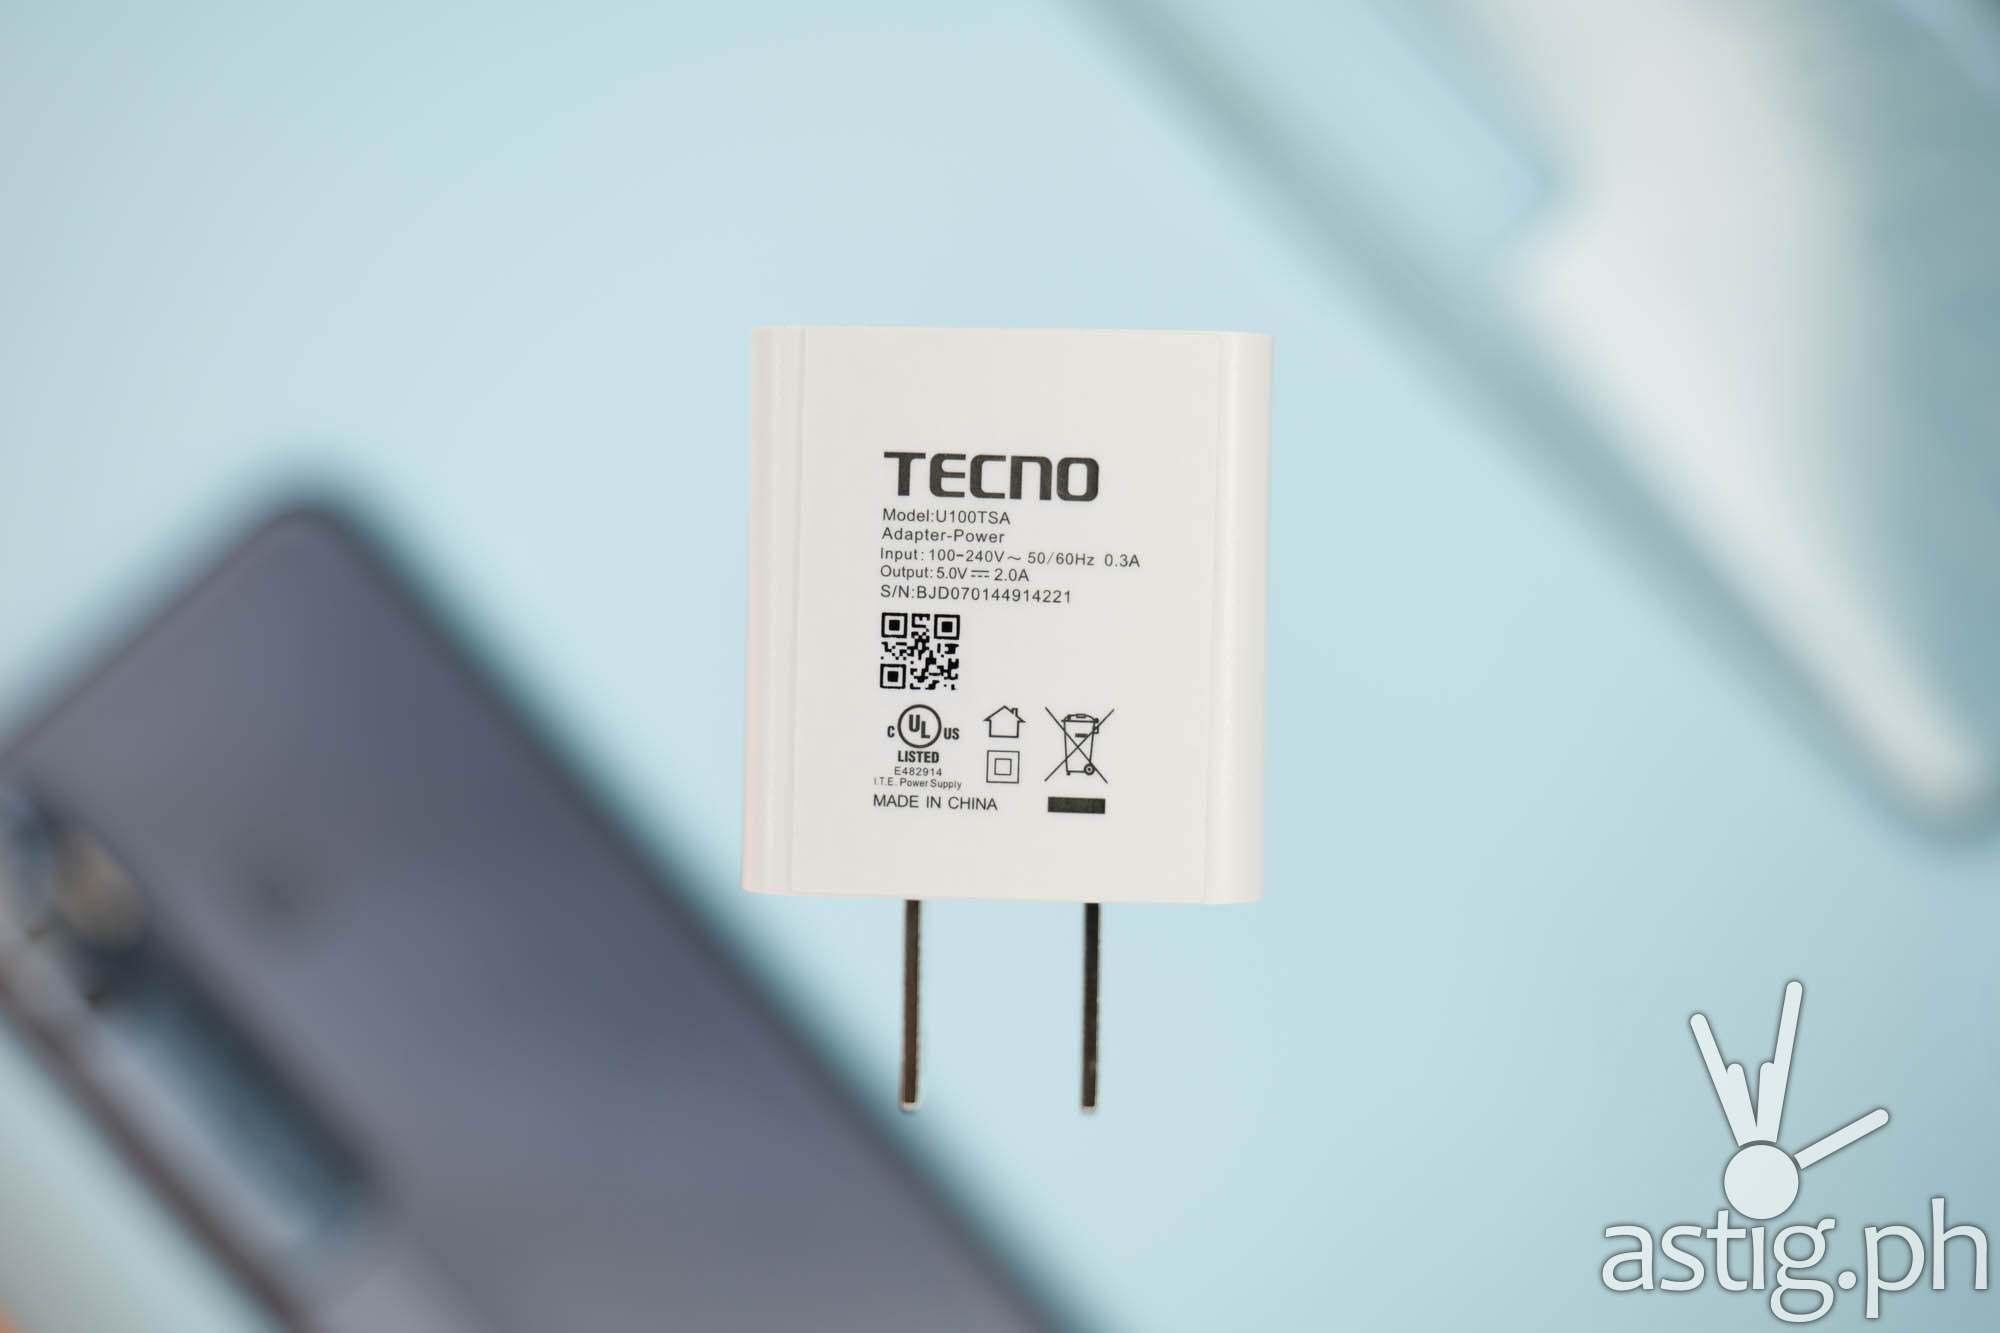 PSU - TECNO Spark 7 Pro